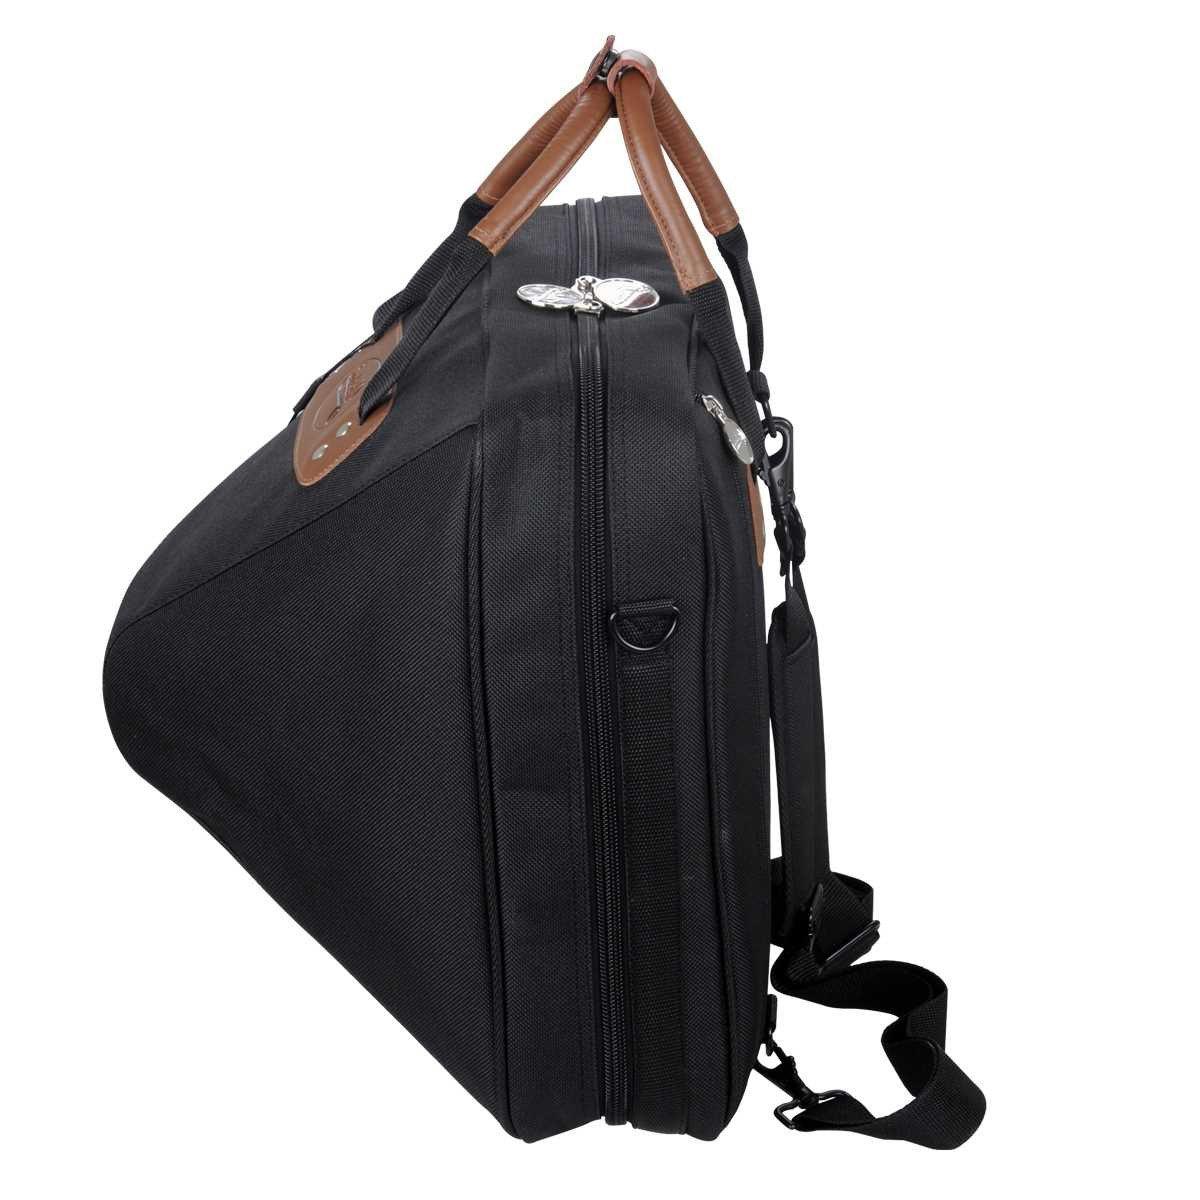 Jinchuan Deluxe French Horn Gig Bag Case Light Weight High Density Foam Padding E-6A Black by Jinchuan (Image #1)